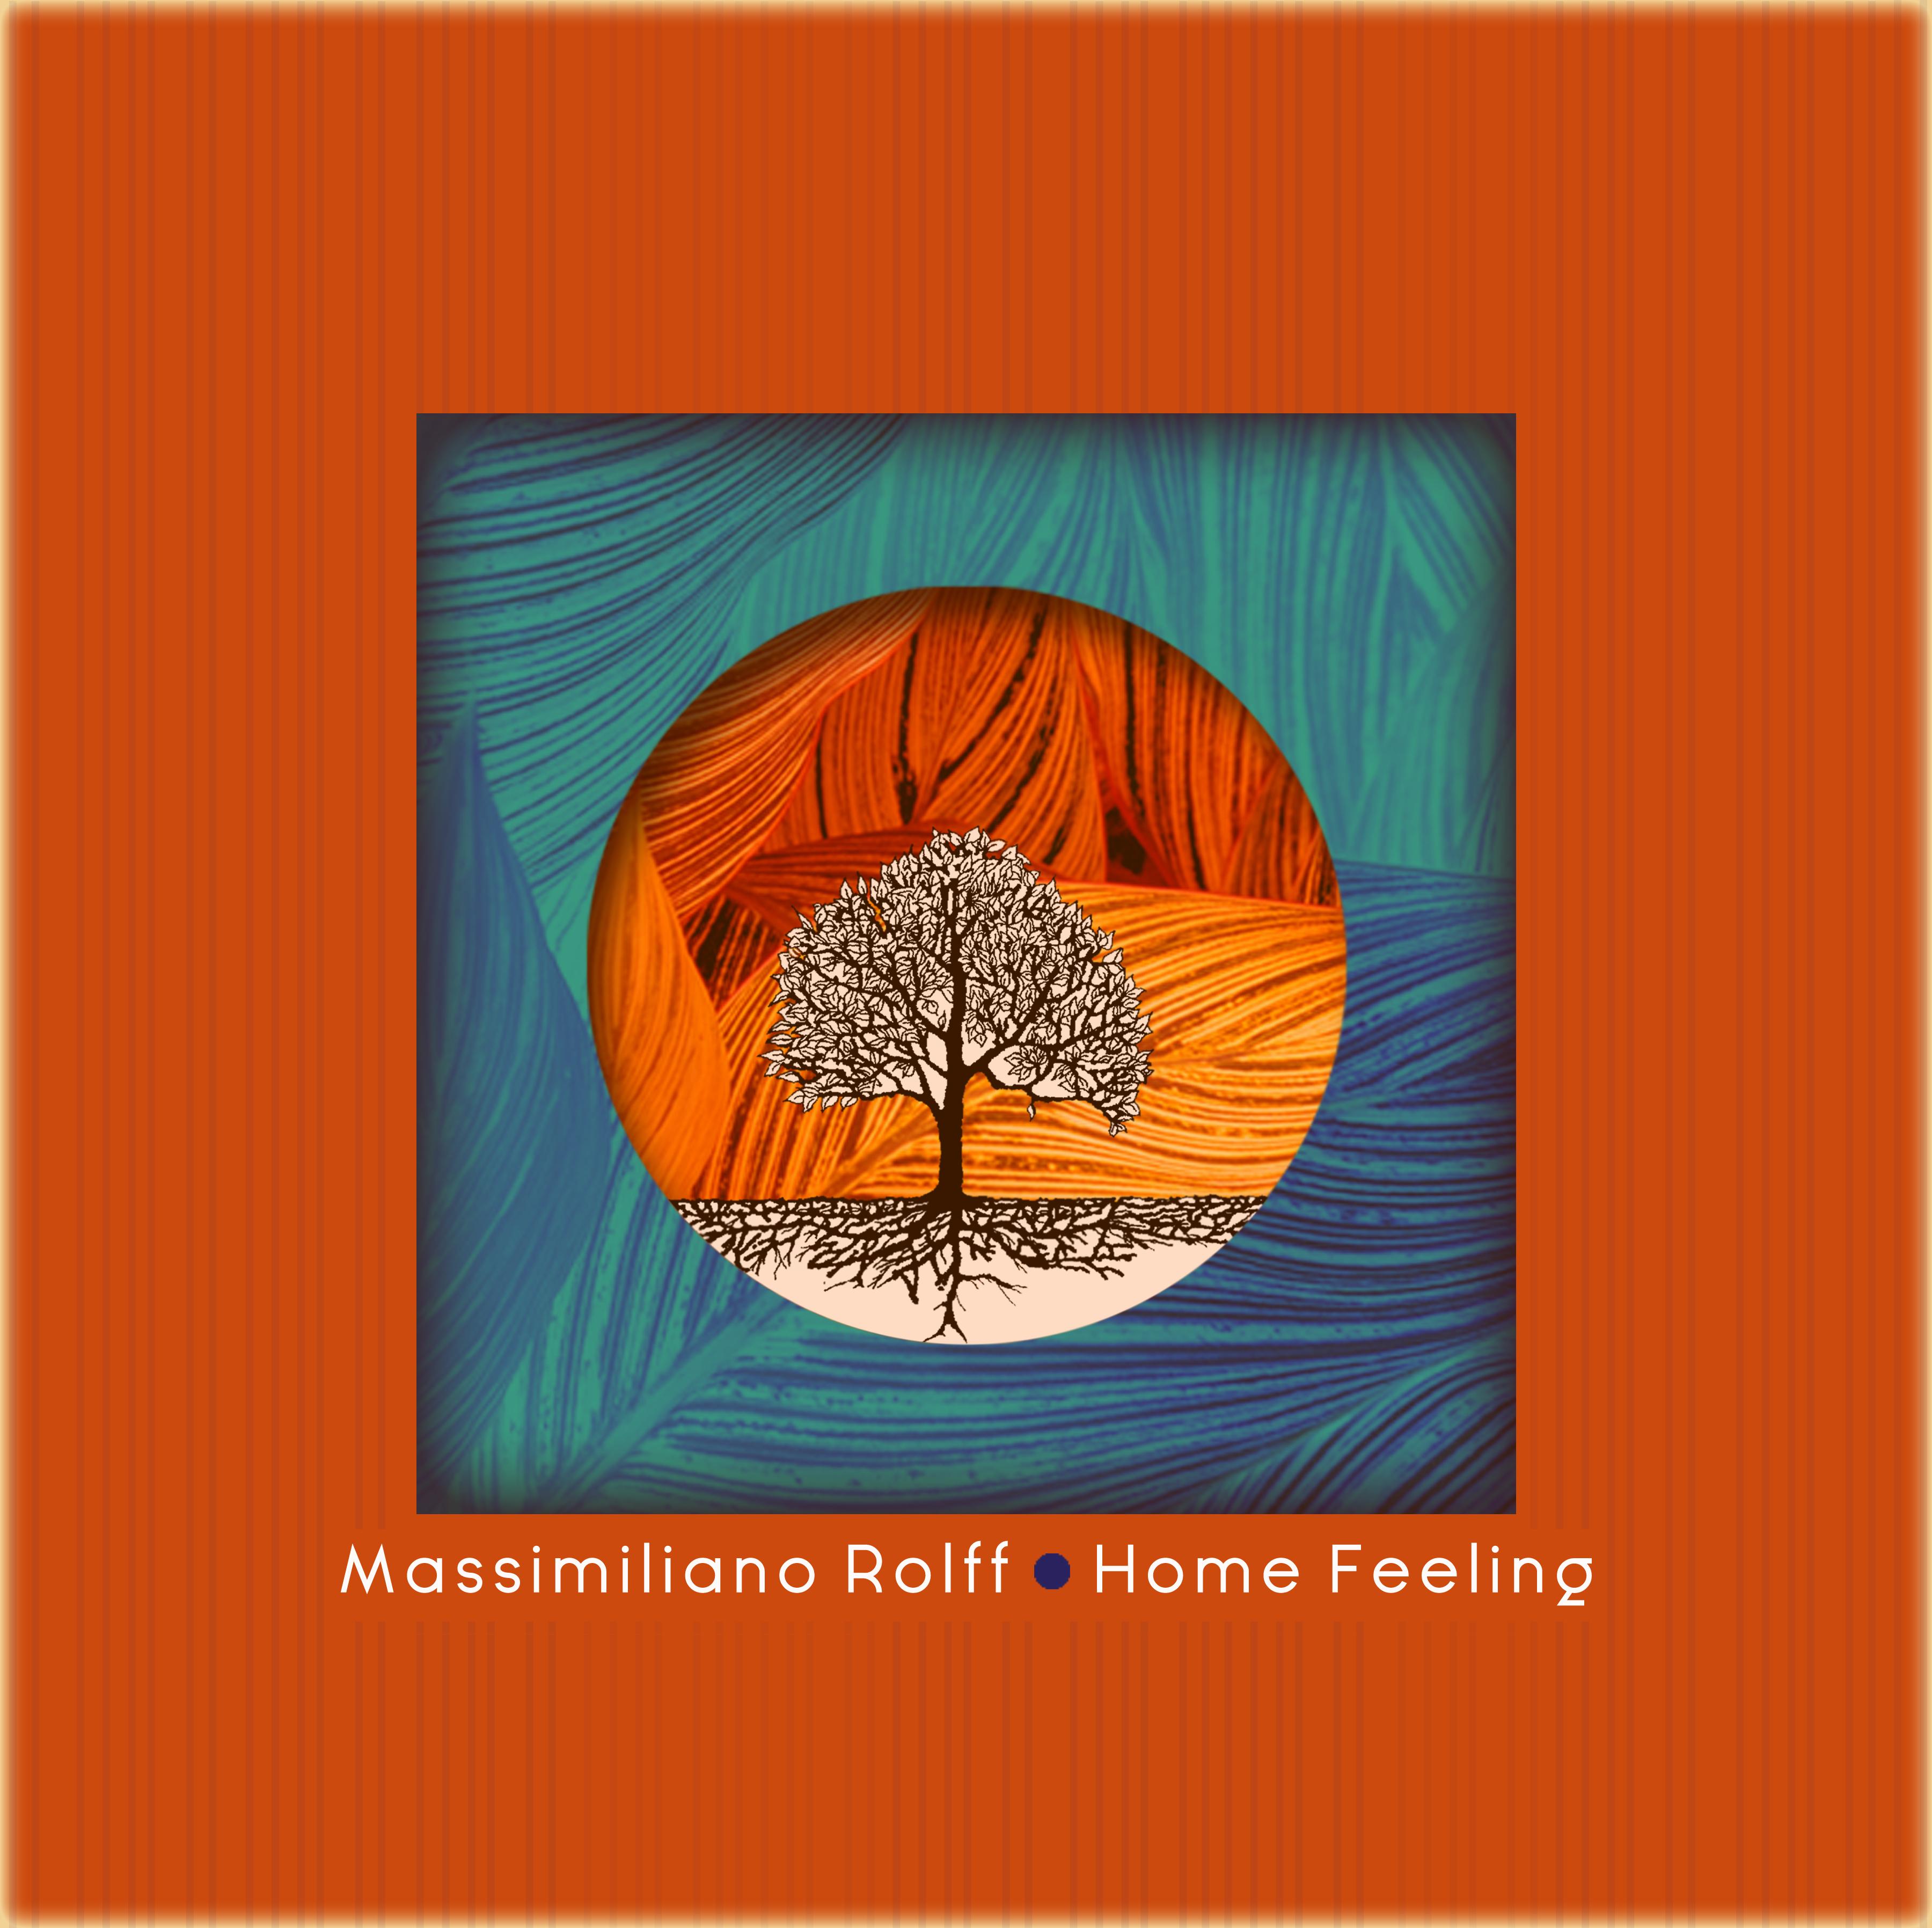 MASSIMILIANO ROLFF - Home Feeling cover